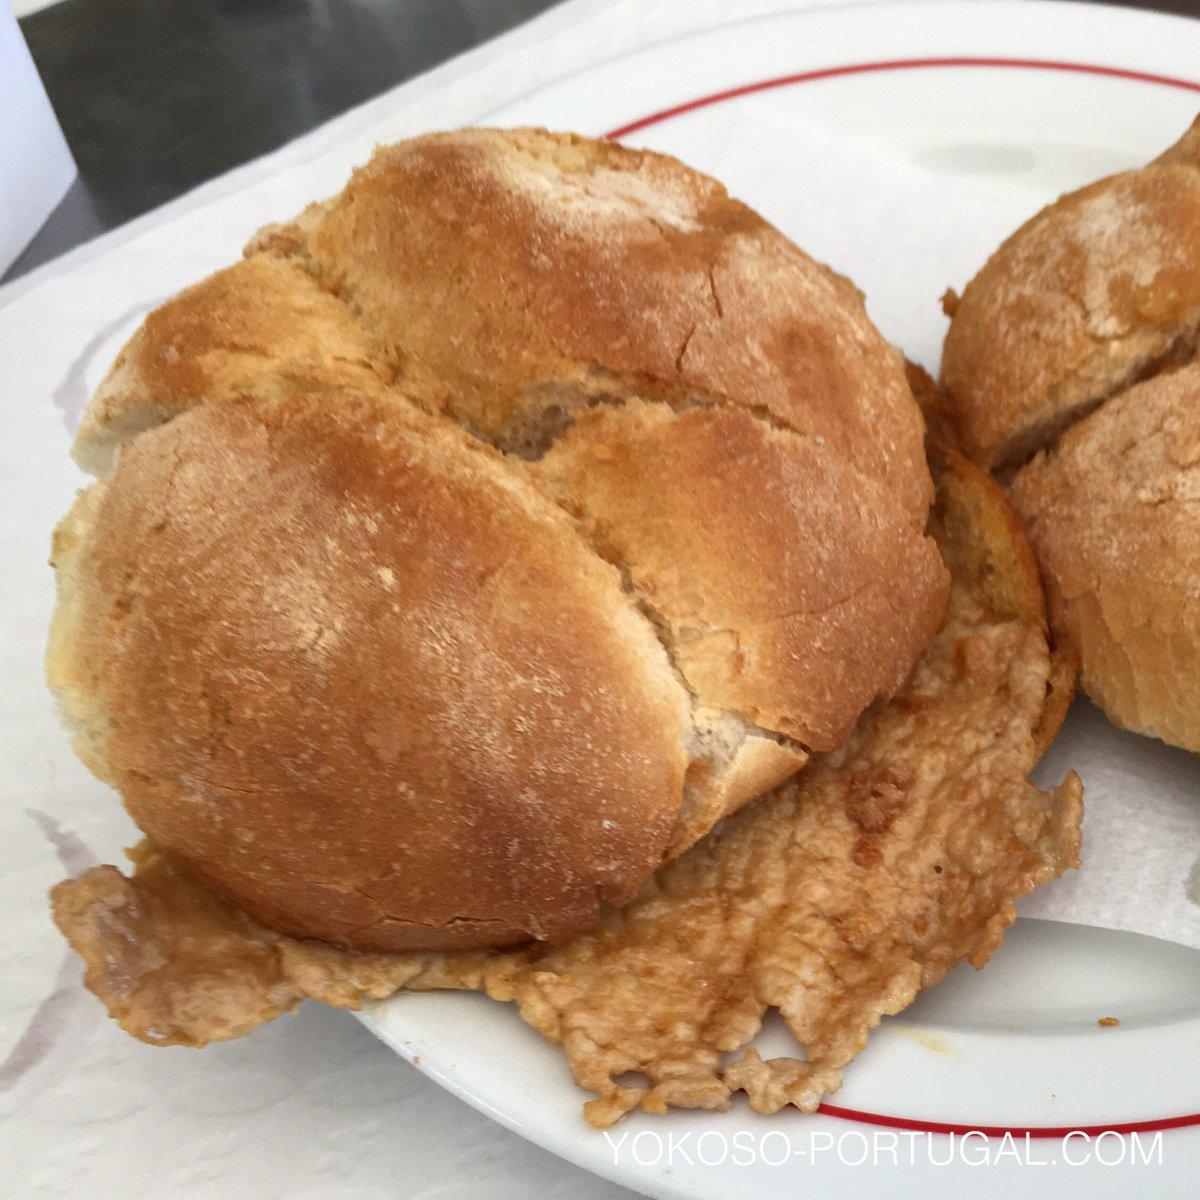 test ツイッターメディア - ポルトガル名物、薄切り豚肉のサンドイッチ、ビファーナの聖地Vendas Novasにある専門店。食事時は並ぶ覚悟でお越しください。 (@ Planícies - A Nova Casa das Bifanas in Vendas Novas, Évora) https://t.co/1nTKgH2E53 https://t.co/egfpLgu85b